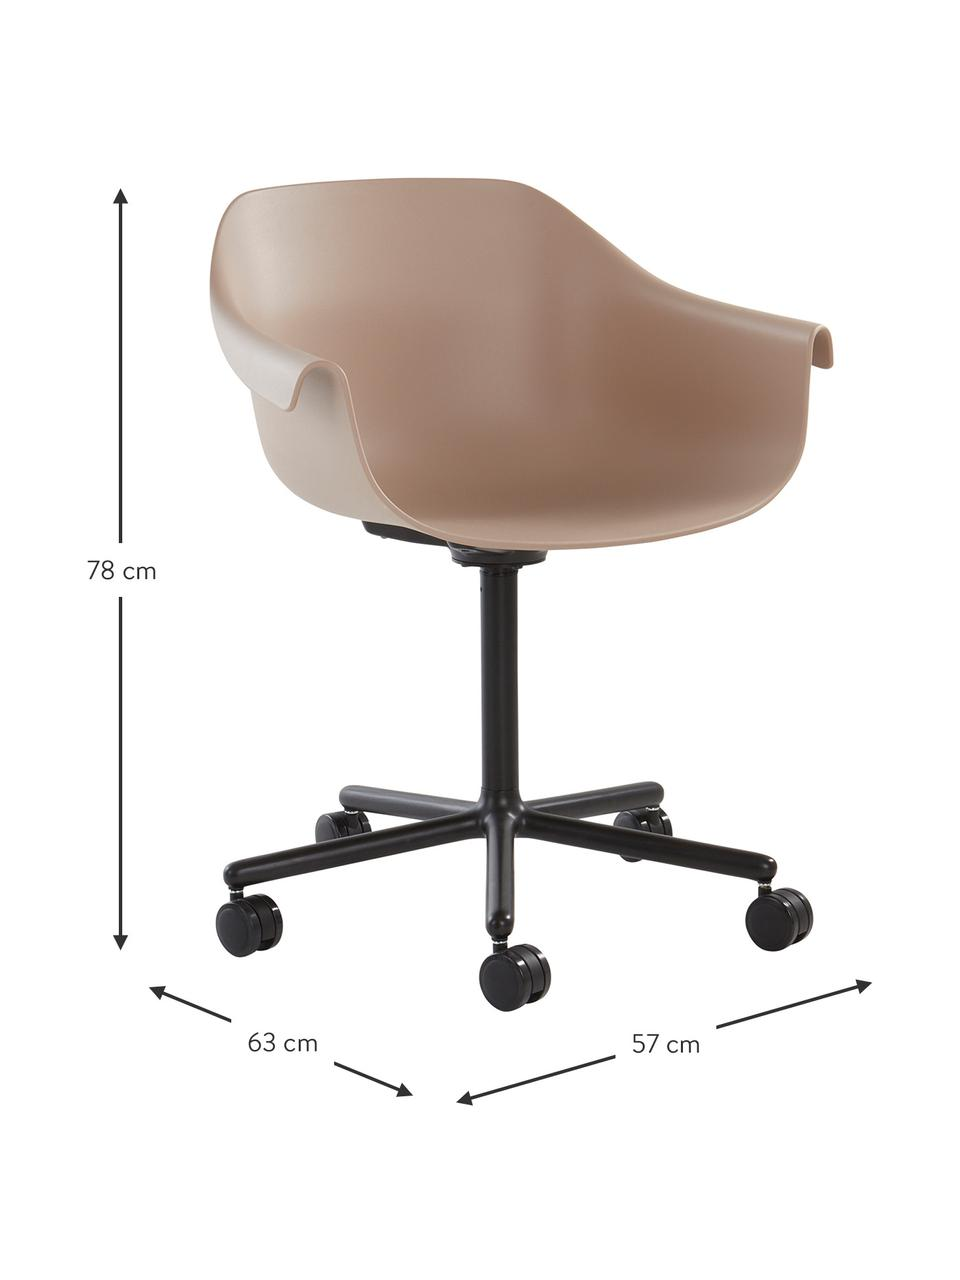 Sedia da ufficio Warrington, Seduta: polipropilene, Struttura: alluminio, Beige, nero, Larg. 57 x Prof. 63 cm